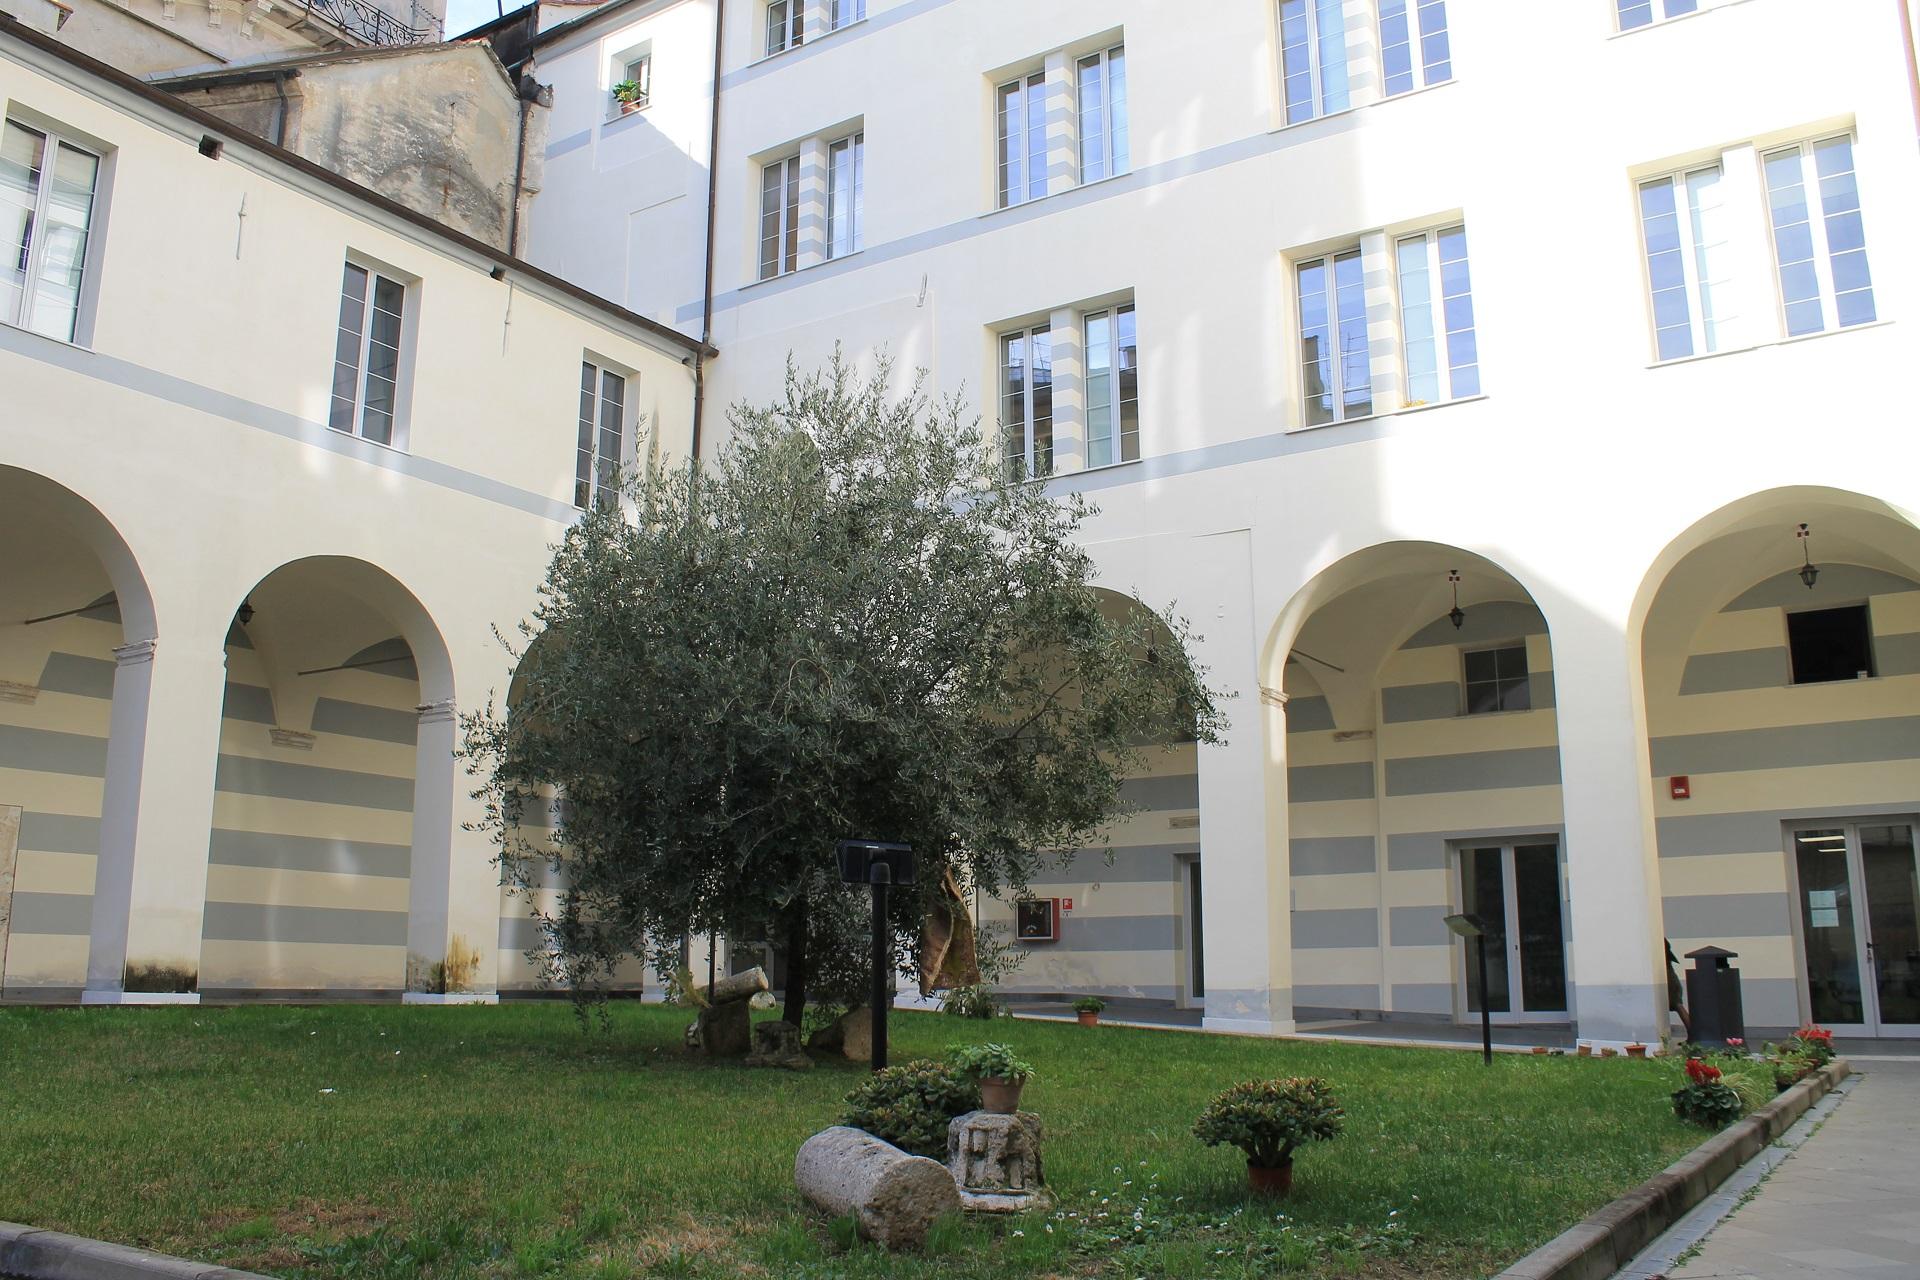 Residenza Protetta Casa Marino Bagnasco | Via Salita Schienacoste | Savona